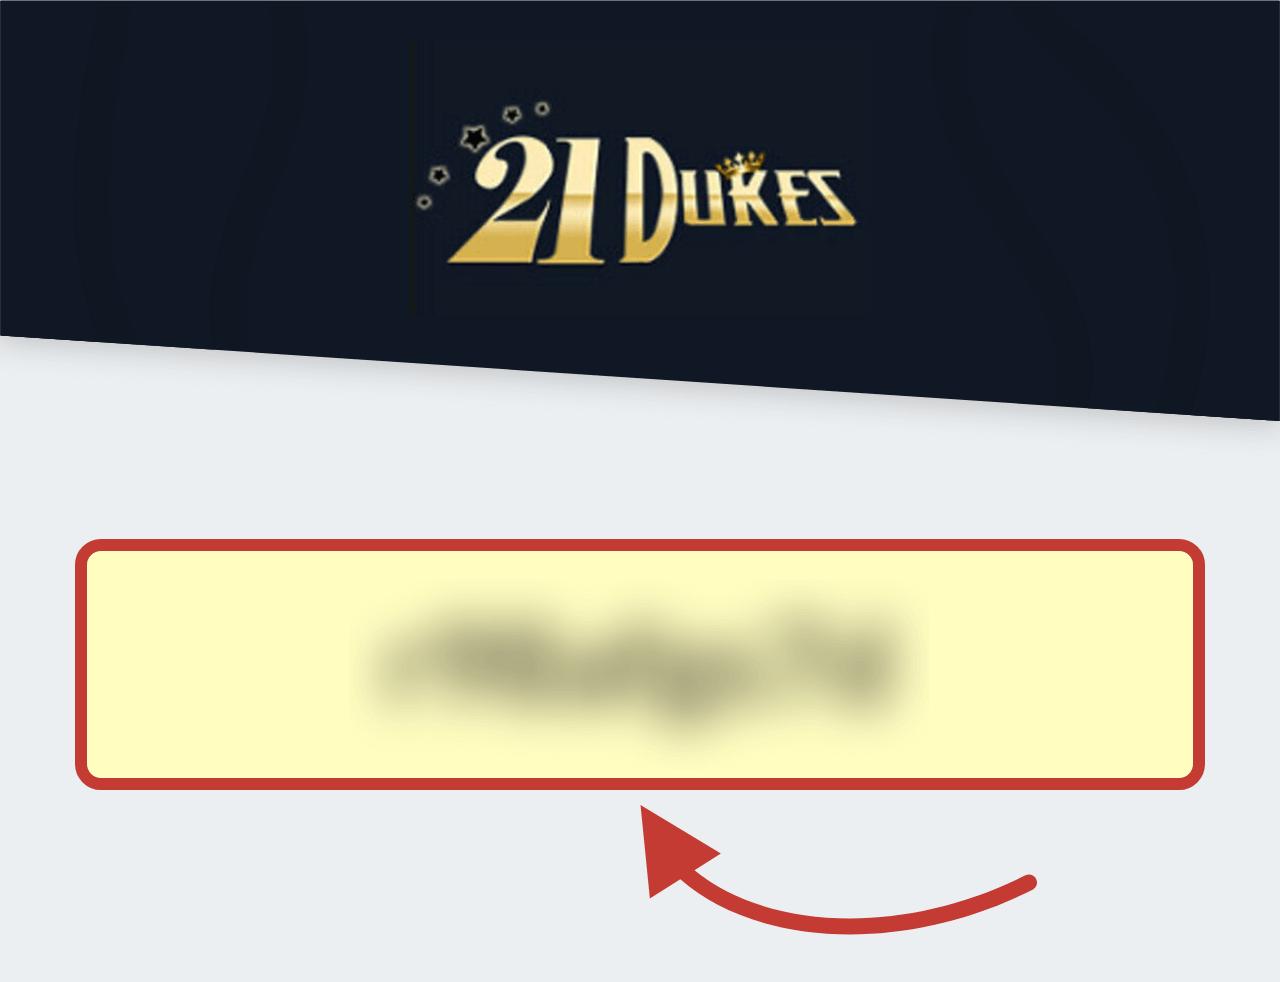 21Dukes Casino Bonus Code